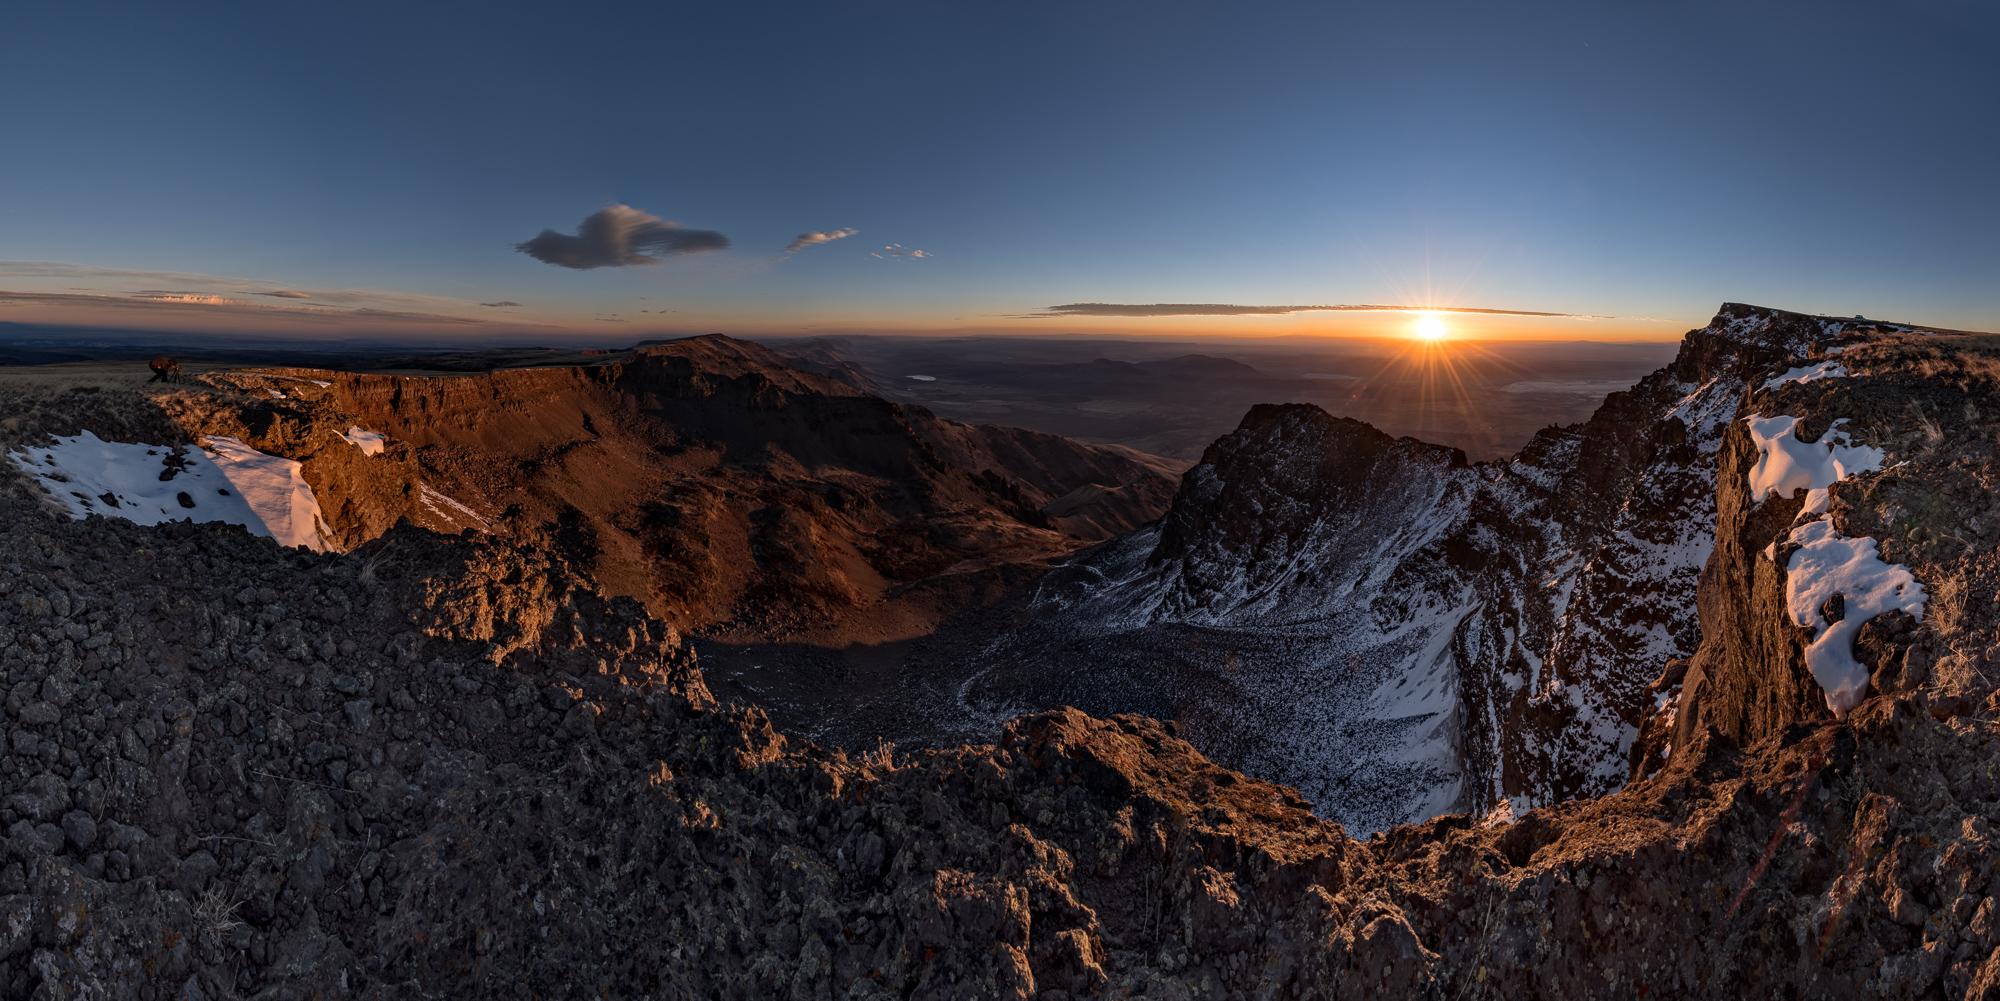 Steens Mountain: 13 image Nikon D810 Panoramic Merger. (Click image  to Enlarge)